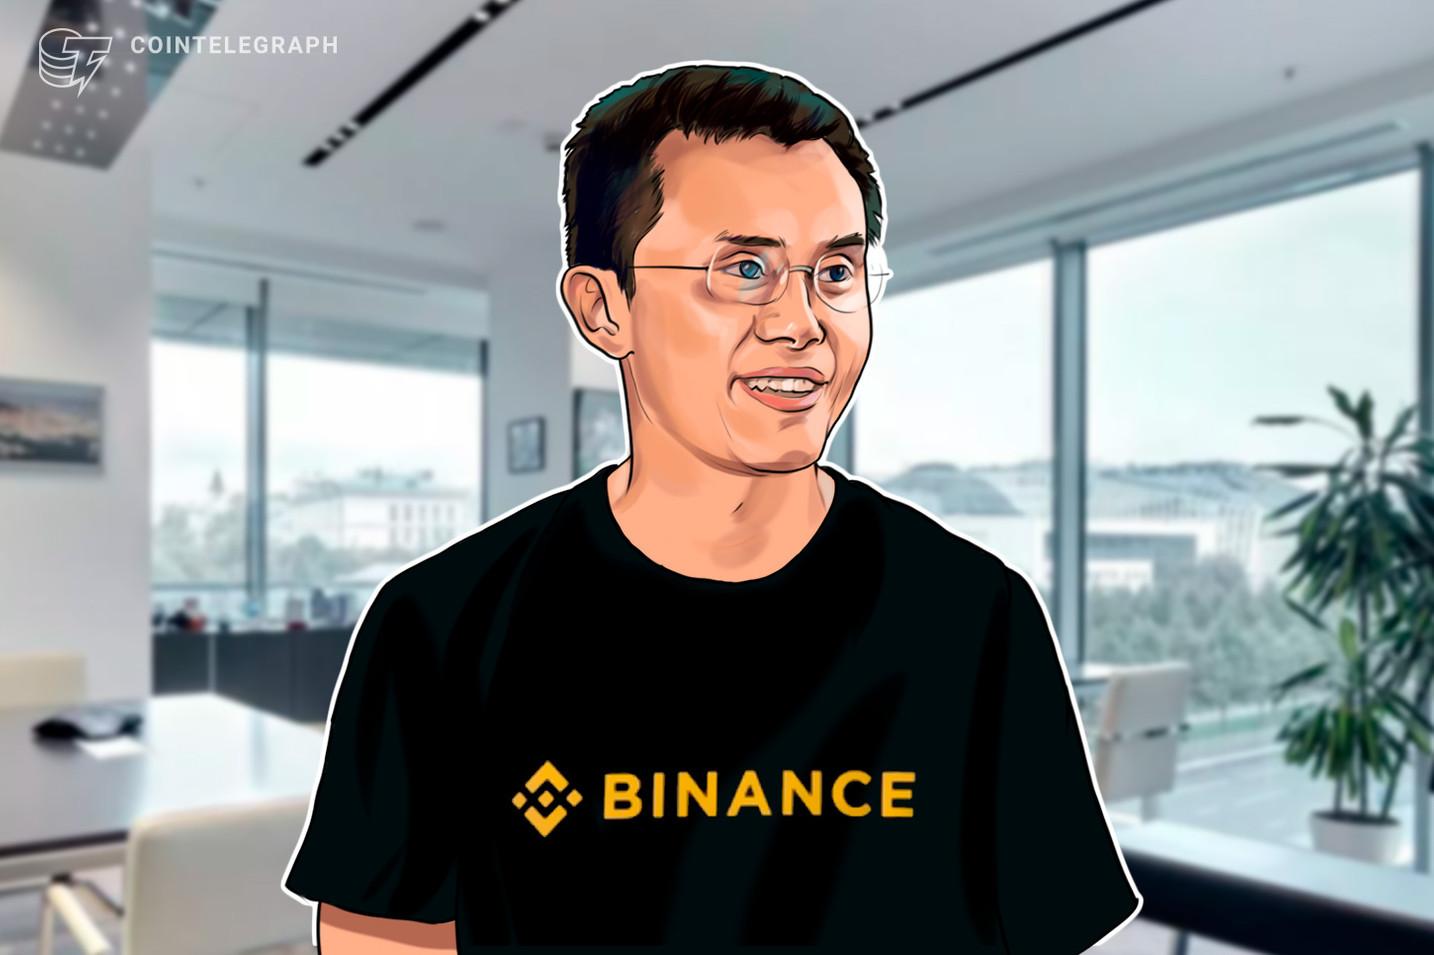 Bitcoin Price Will See $16,000 'Soon-Ish,' Predicts Binance CEO CZ